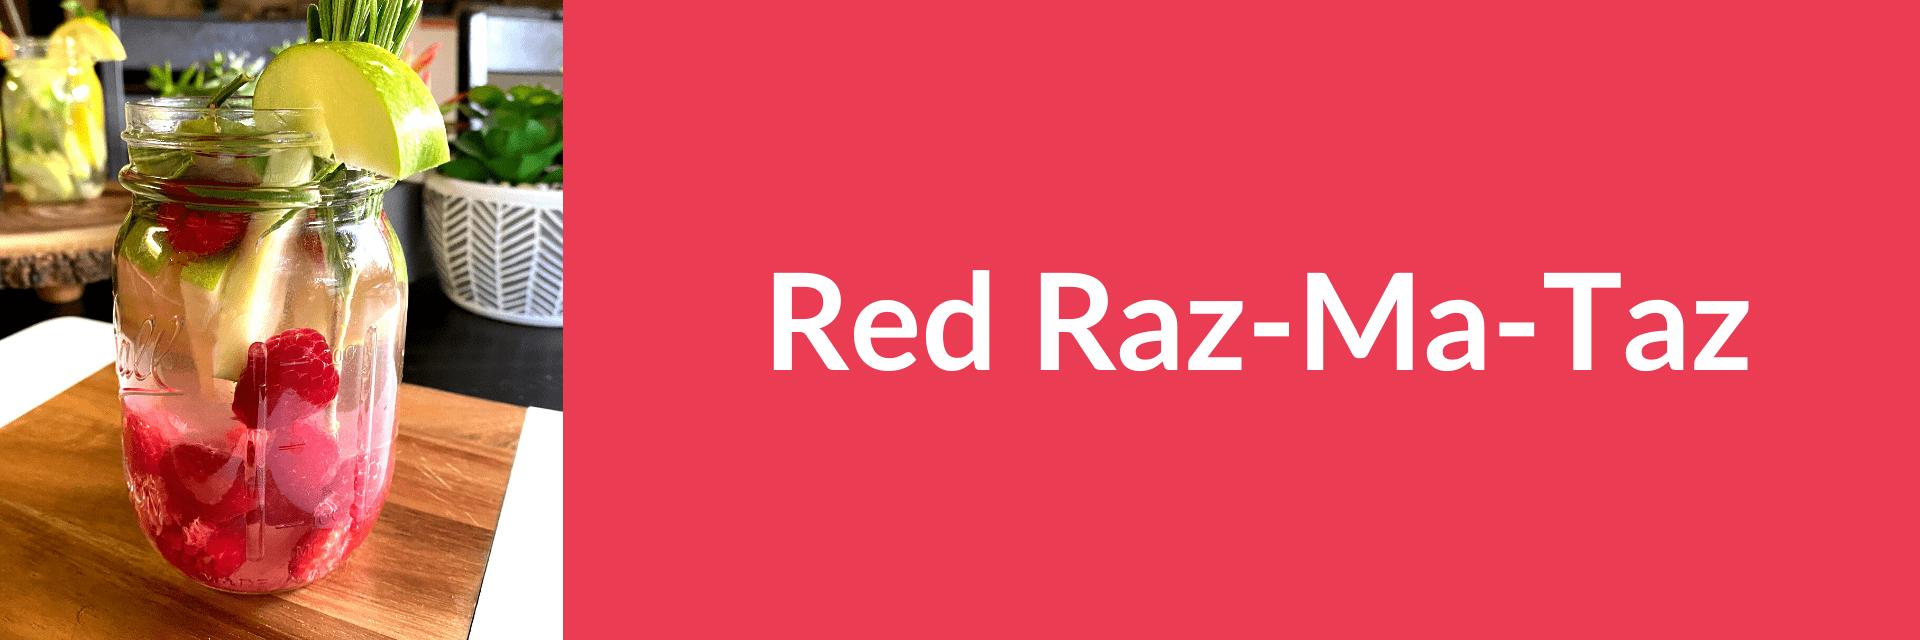 Red Raz-Ma-Taz banner